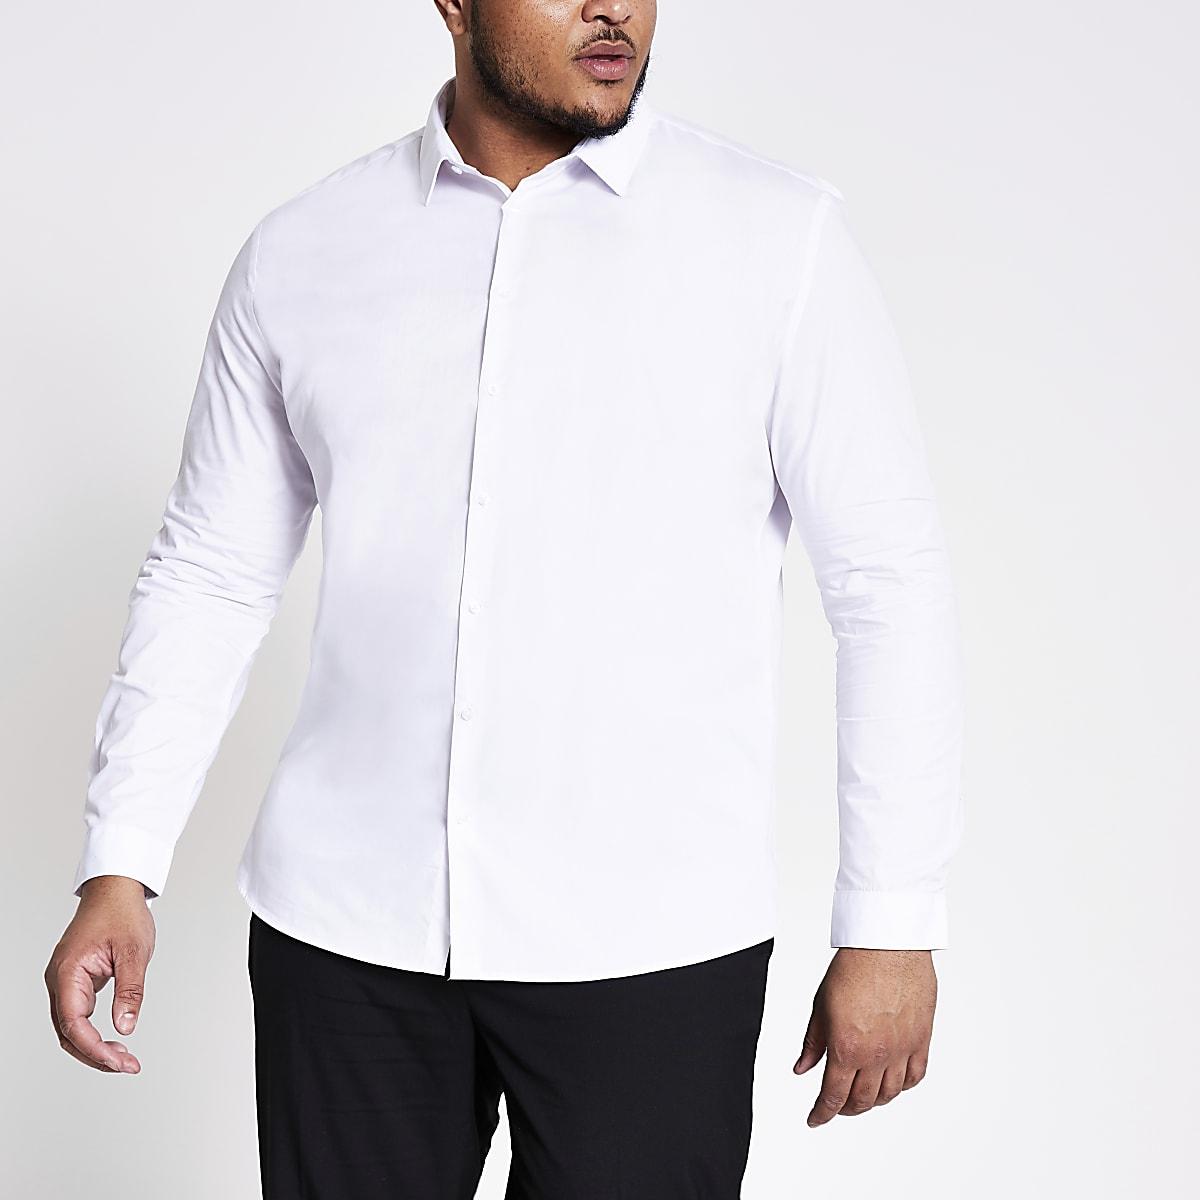 Chemise Big & Tall blanche coupe slim habillée